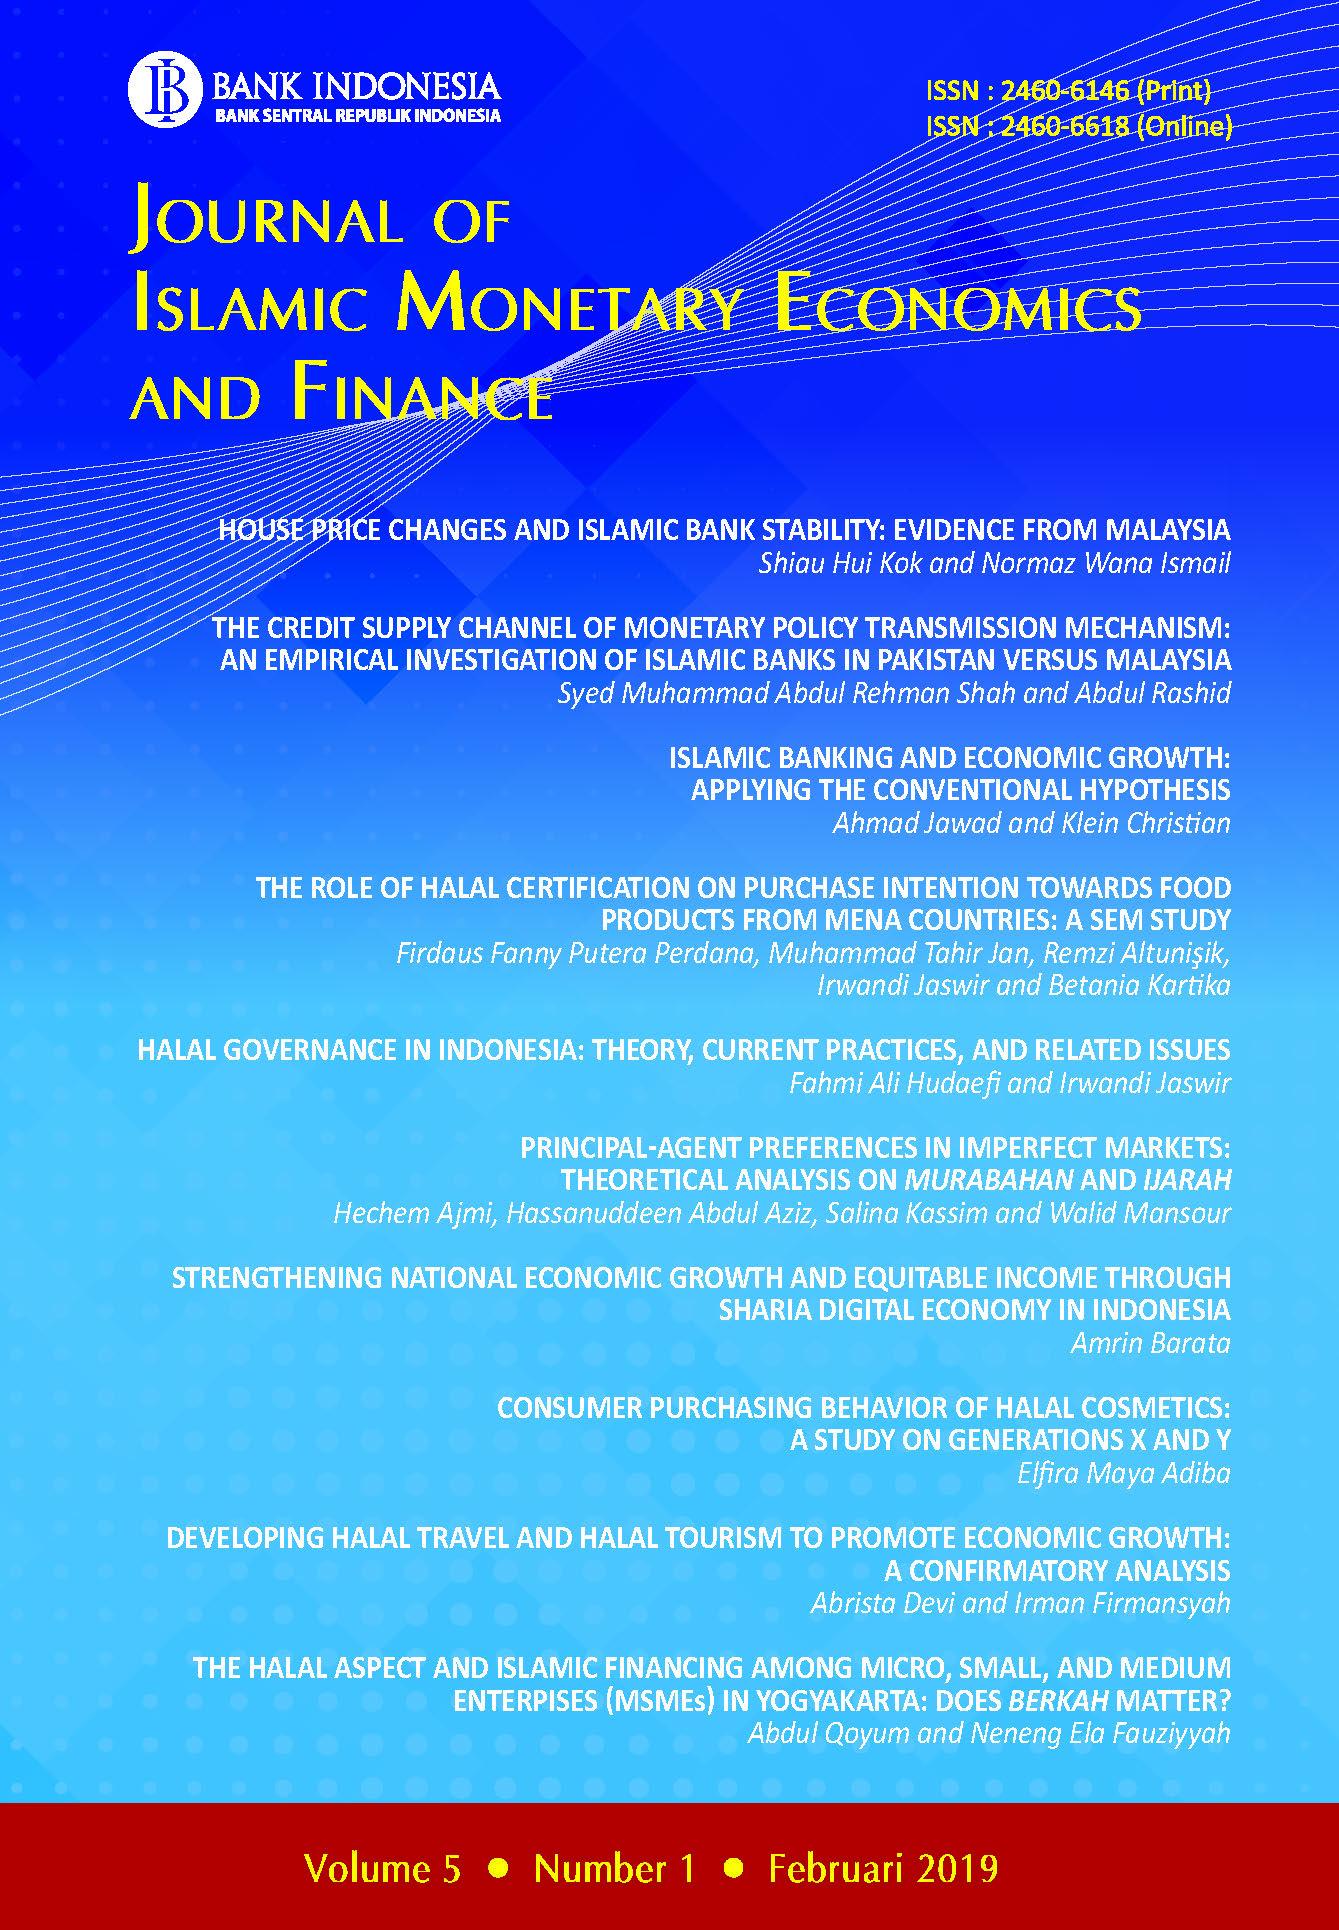 Vol 5 No 1 (2019) | Journal of Islamic Monetary Economics and Finance